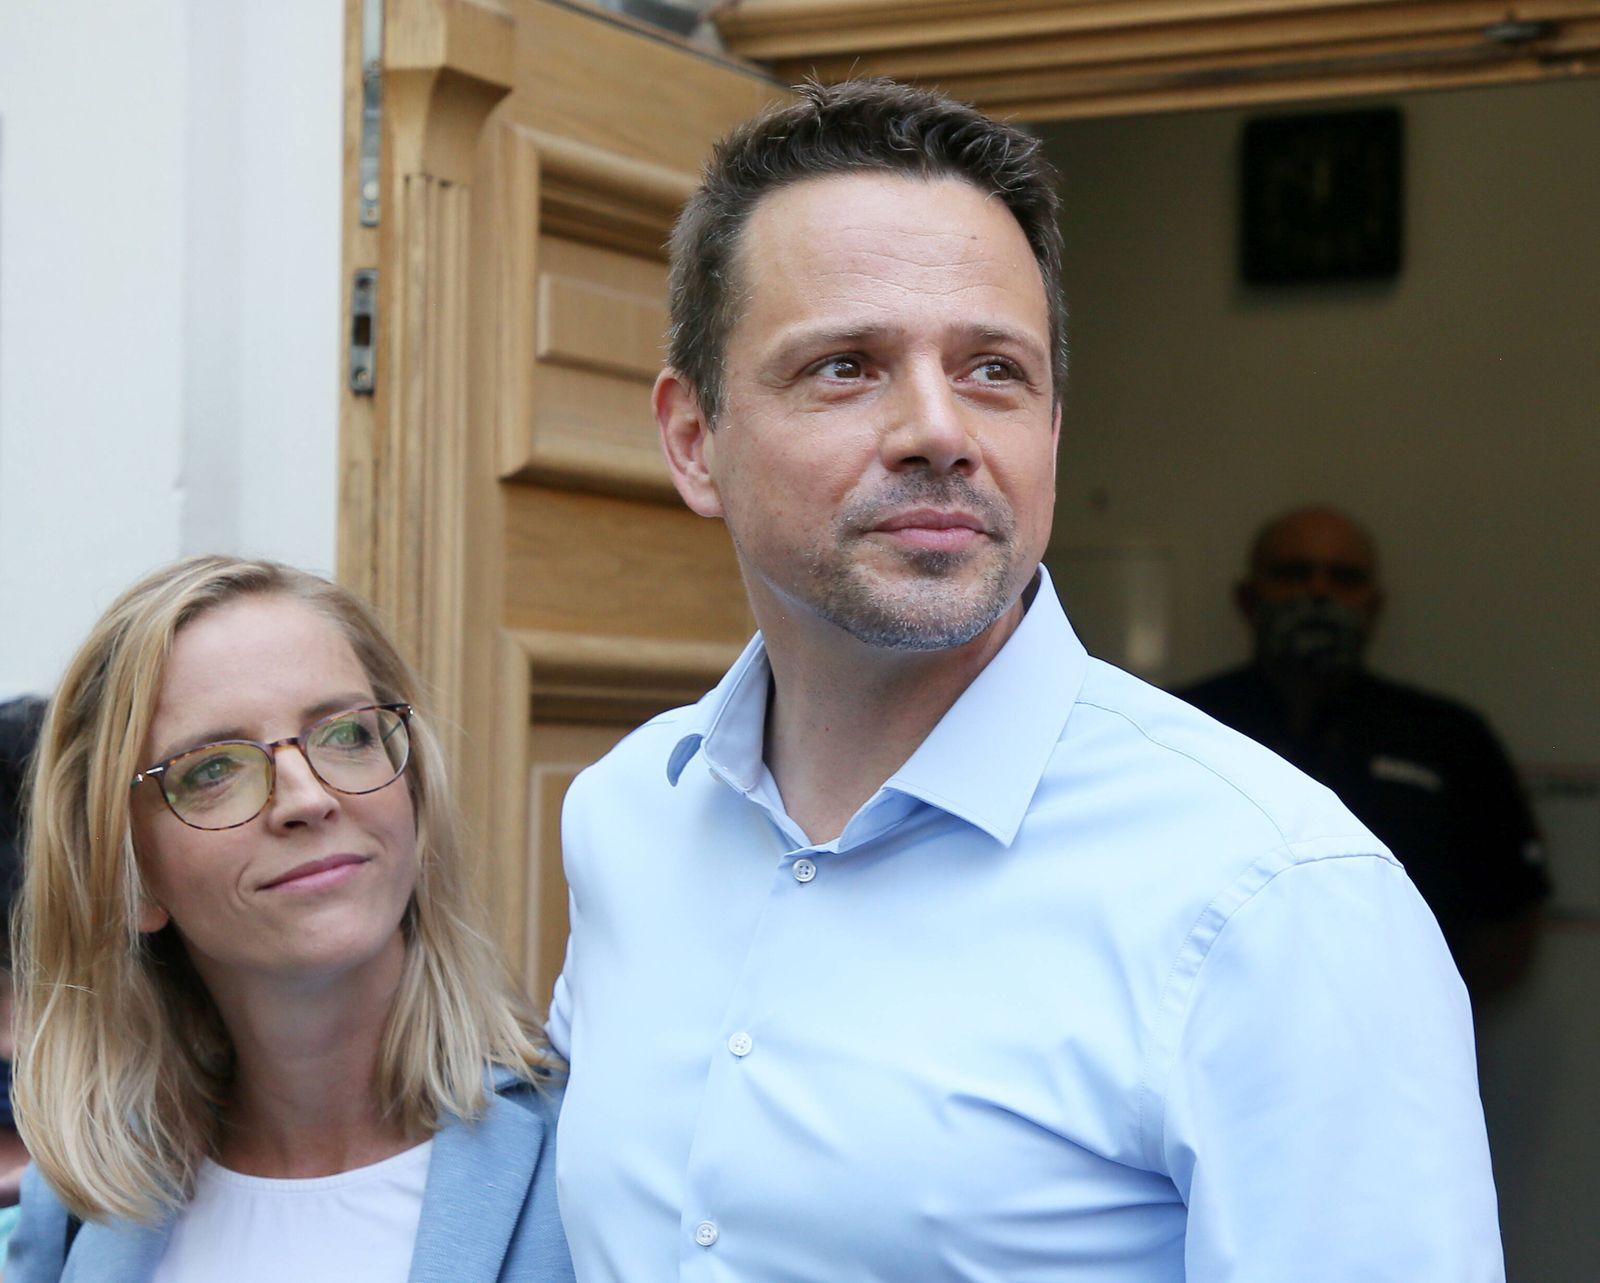 The Civic Coalition presidential candidate Rafal Trzaskowski and his wife Malgorzata Trzaskowska cast their ballots at